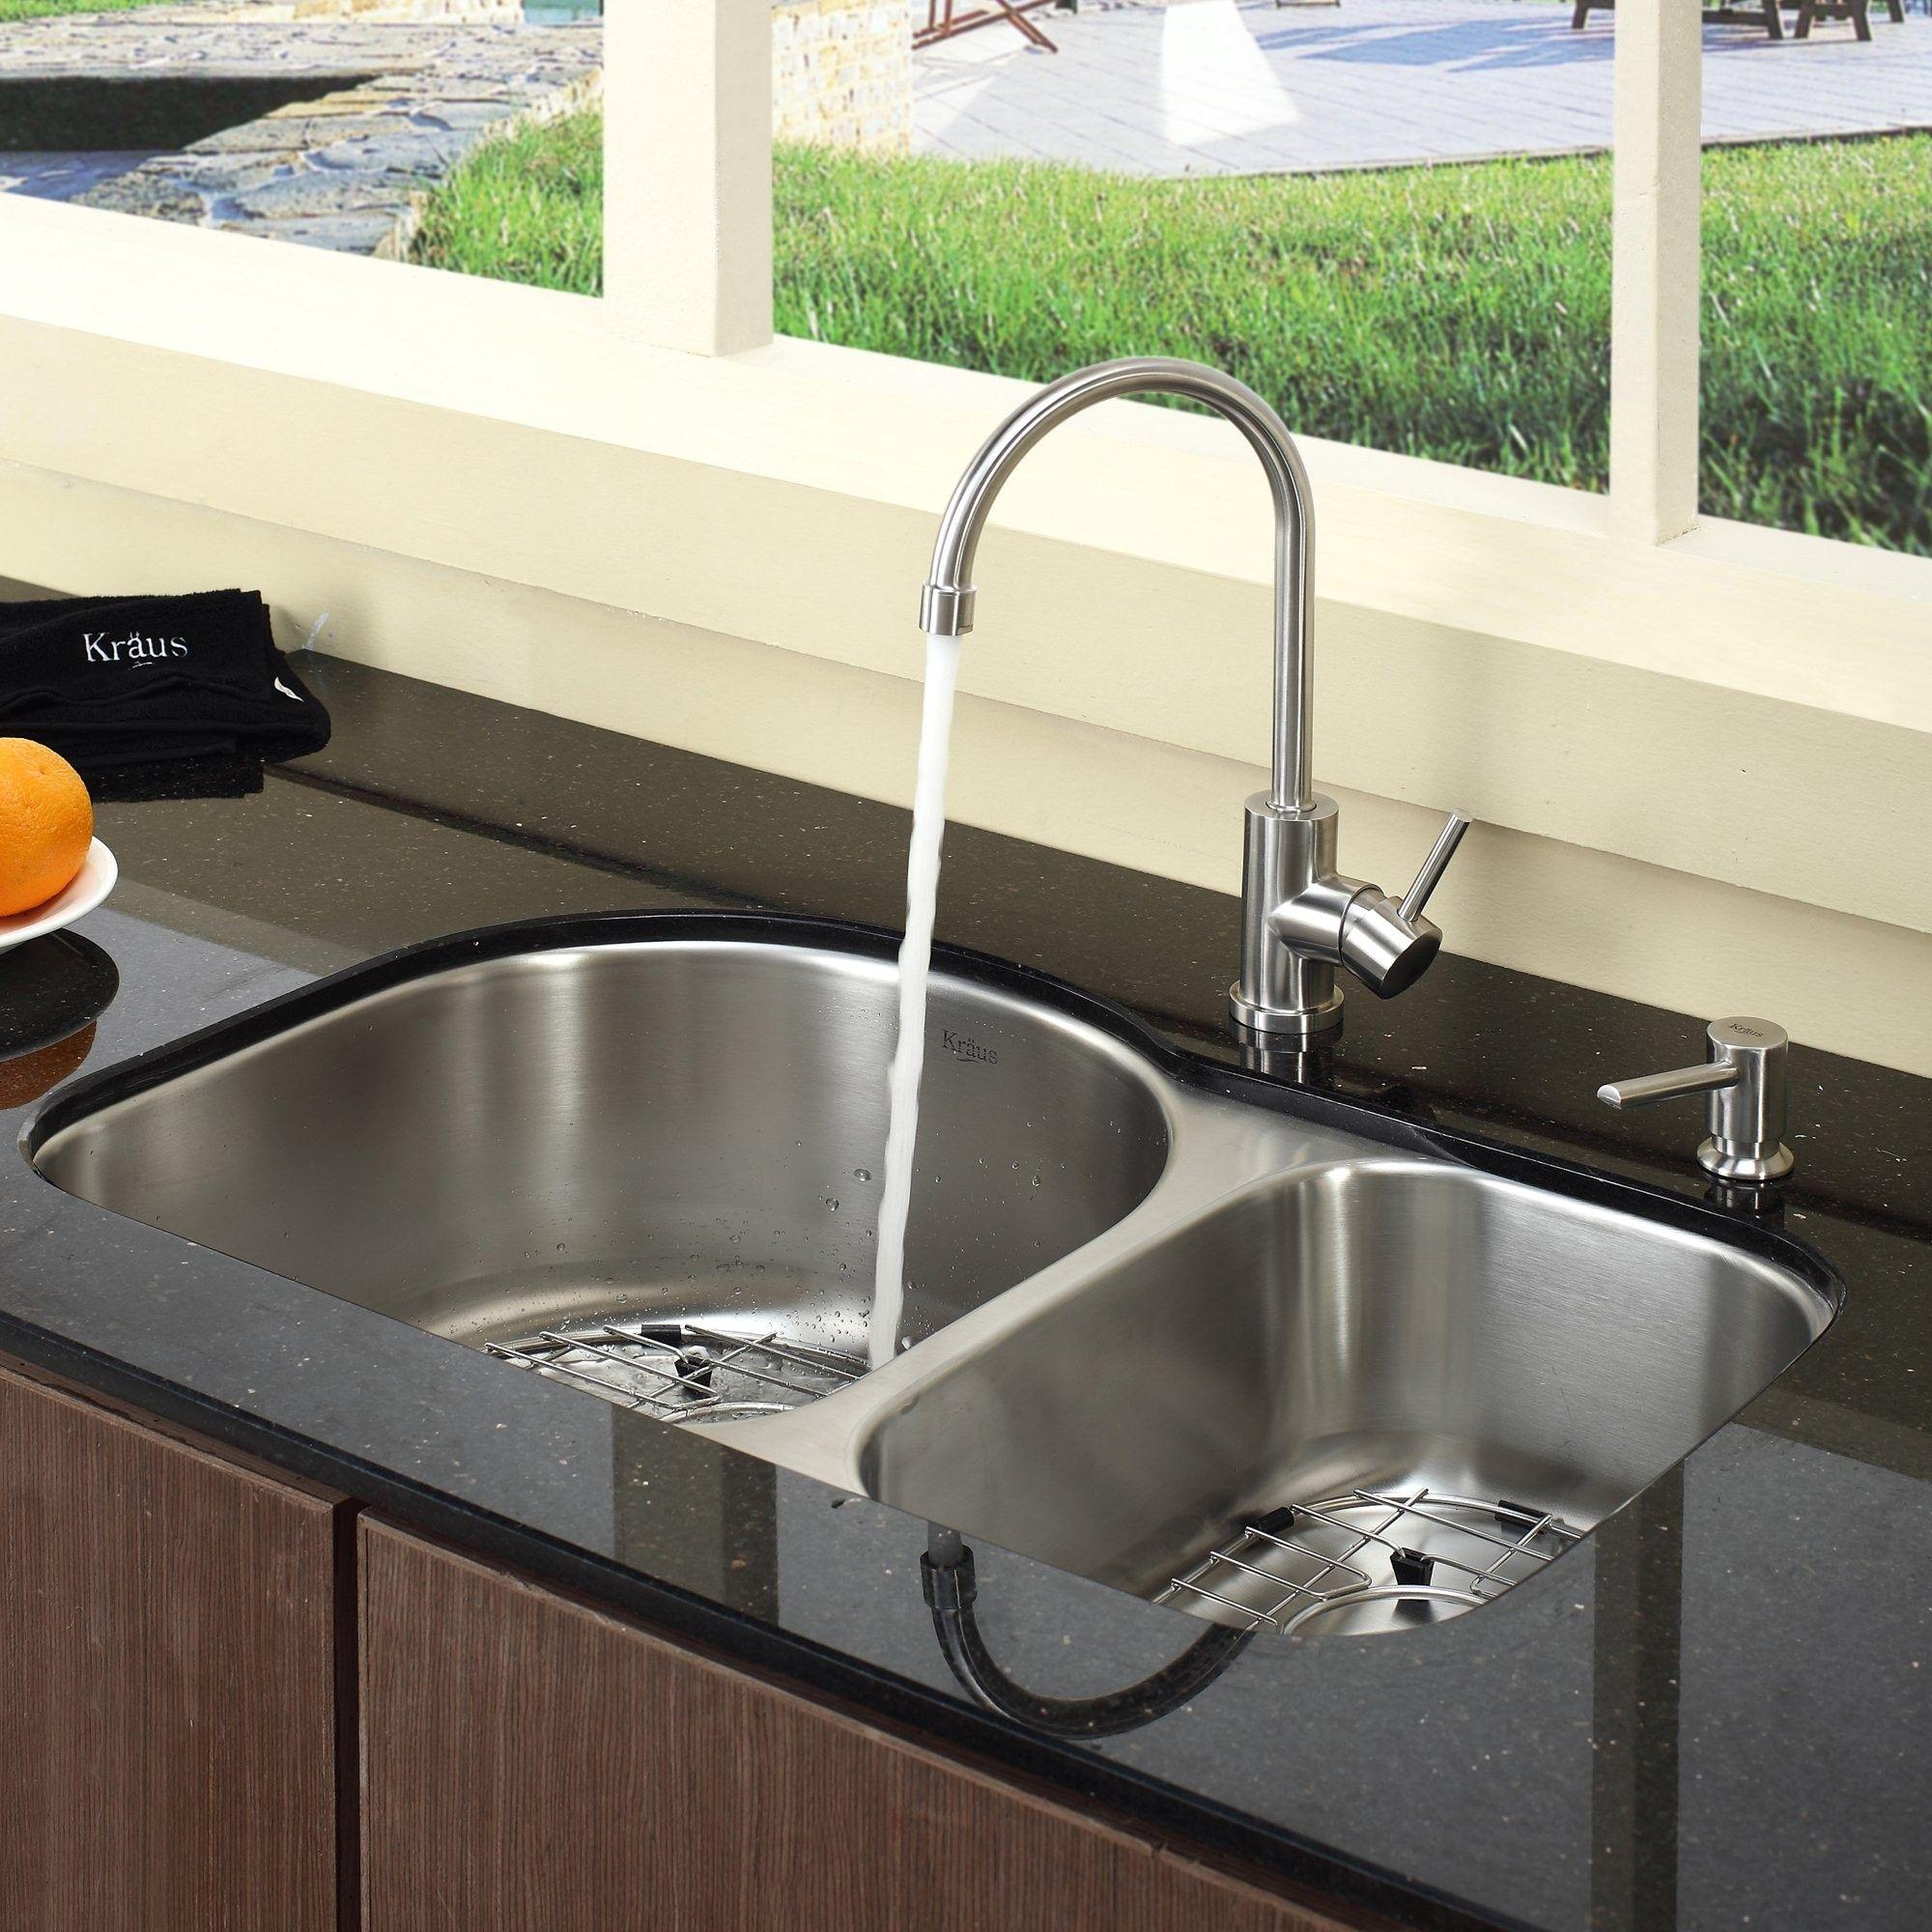 Modern Undermount Stainless Steel Sinks For Best Kitchen Sink Idea Double Bowl Undermount Stainless Steel